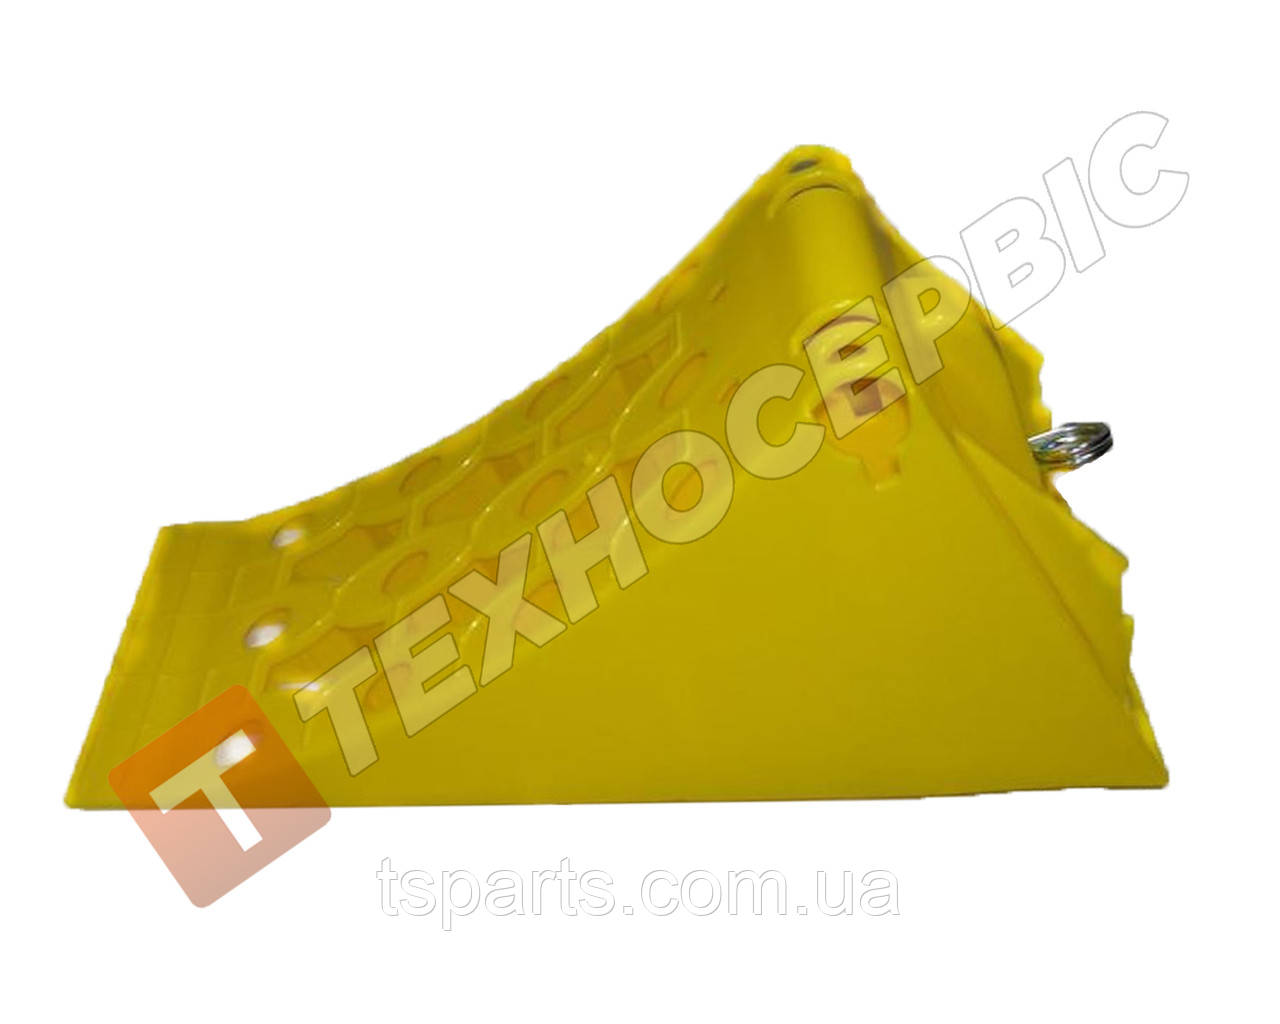 Противооткатные колодки пластик 415х160х190(мм),Турция